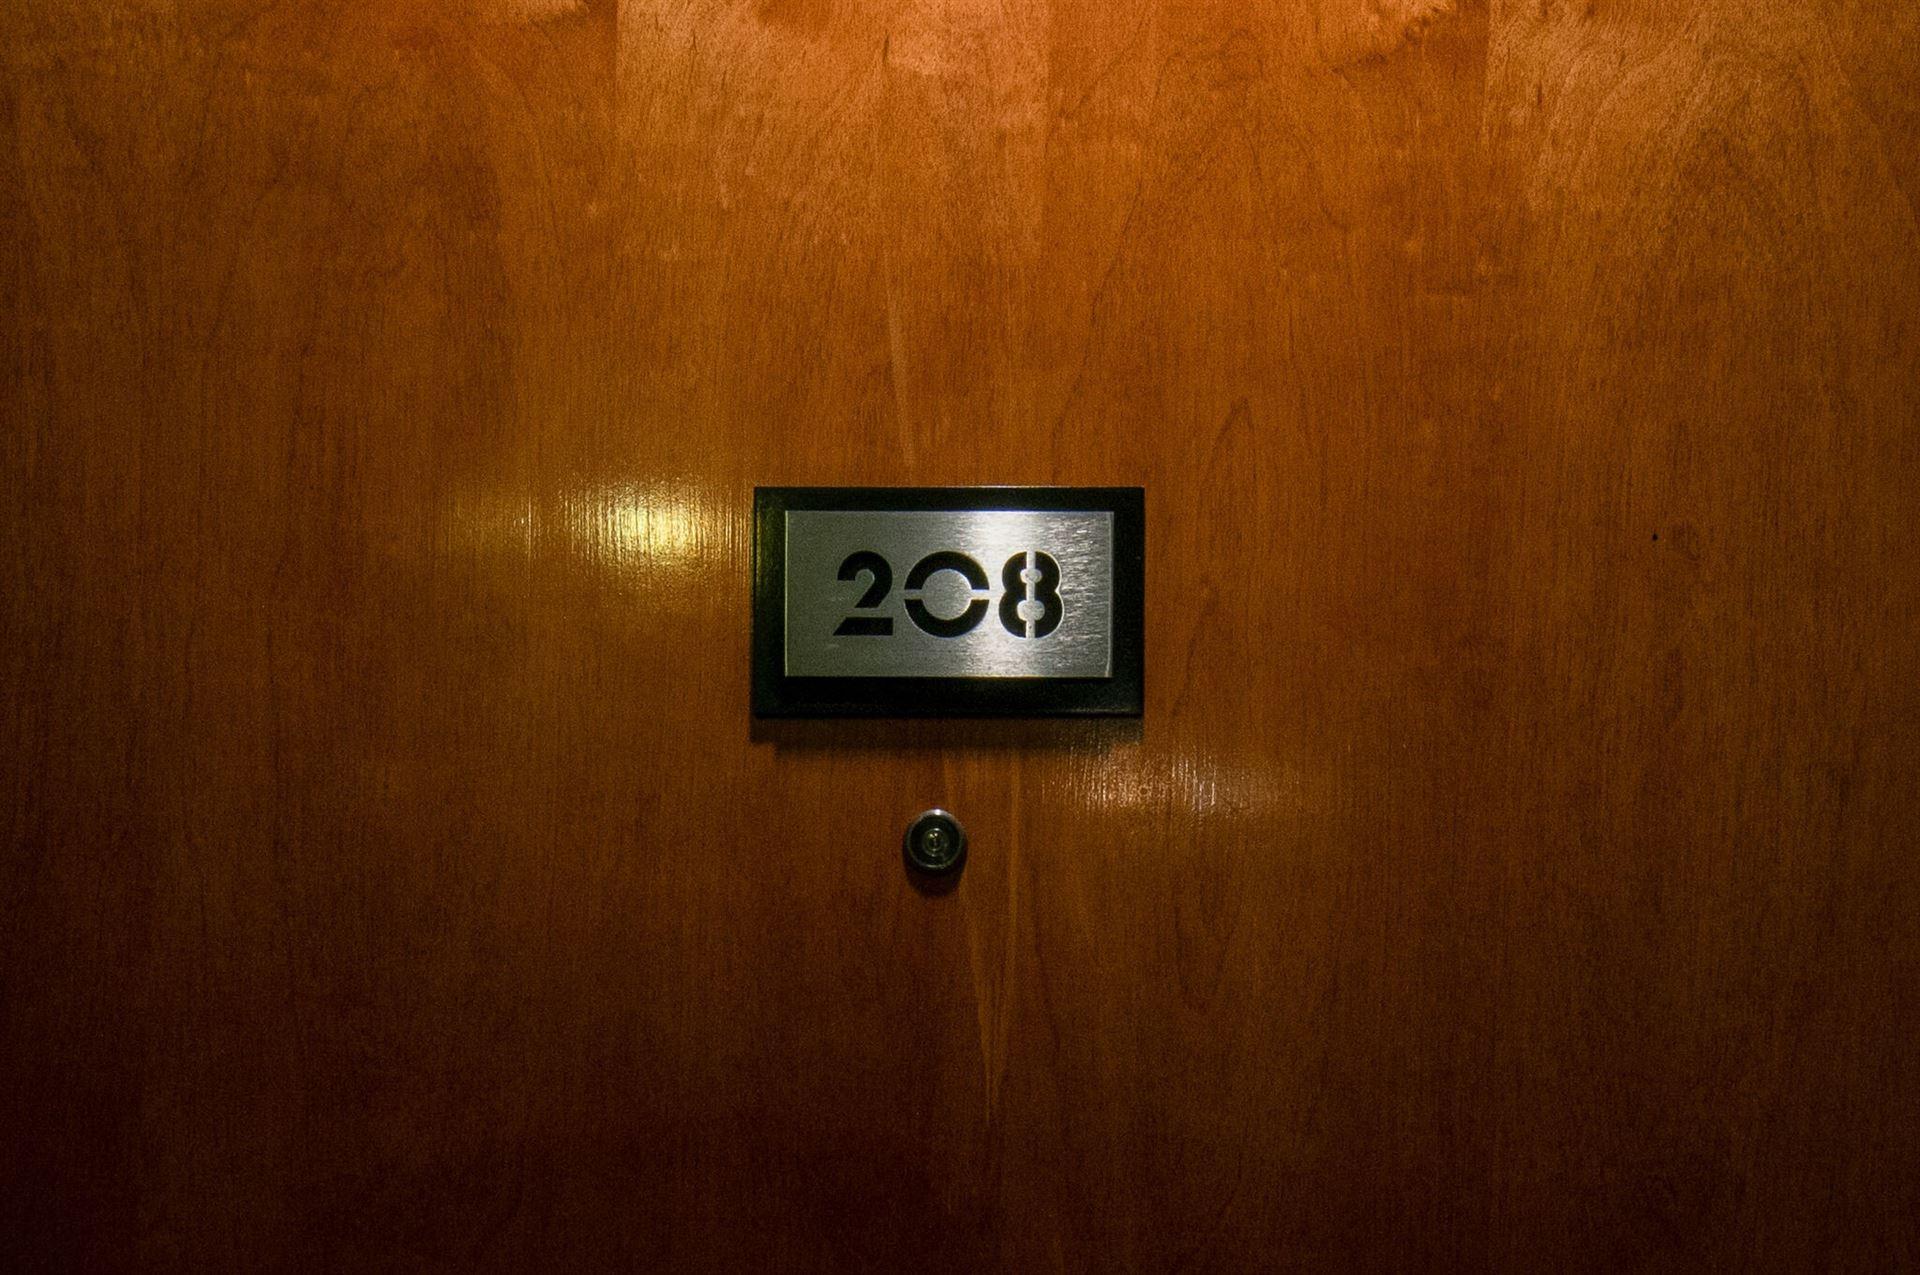 700 Church St #208, Nashville, TN 37203 - MLS#: 2290287